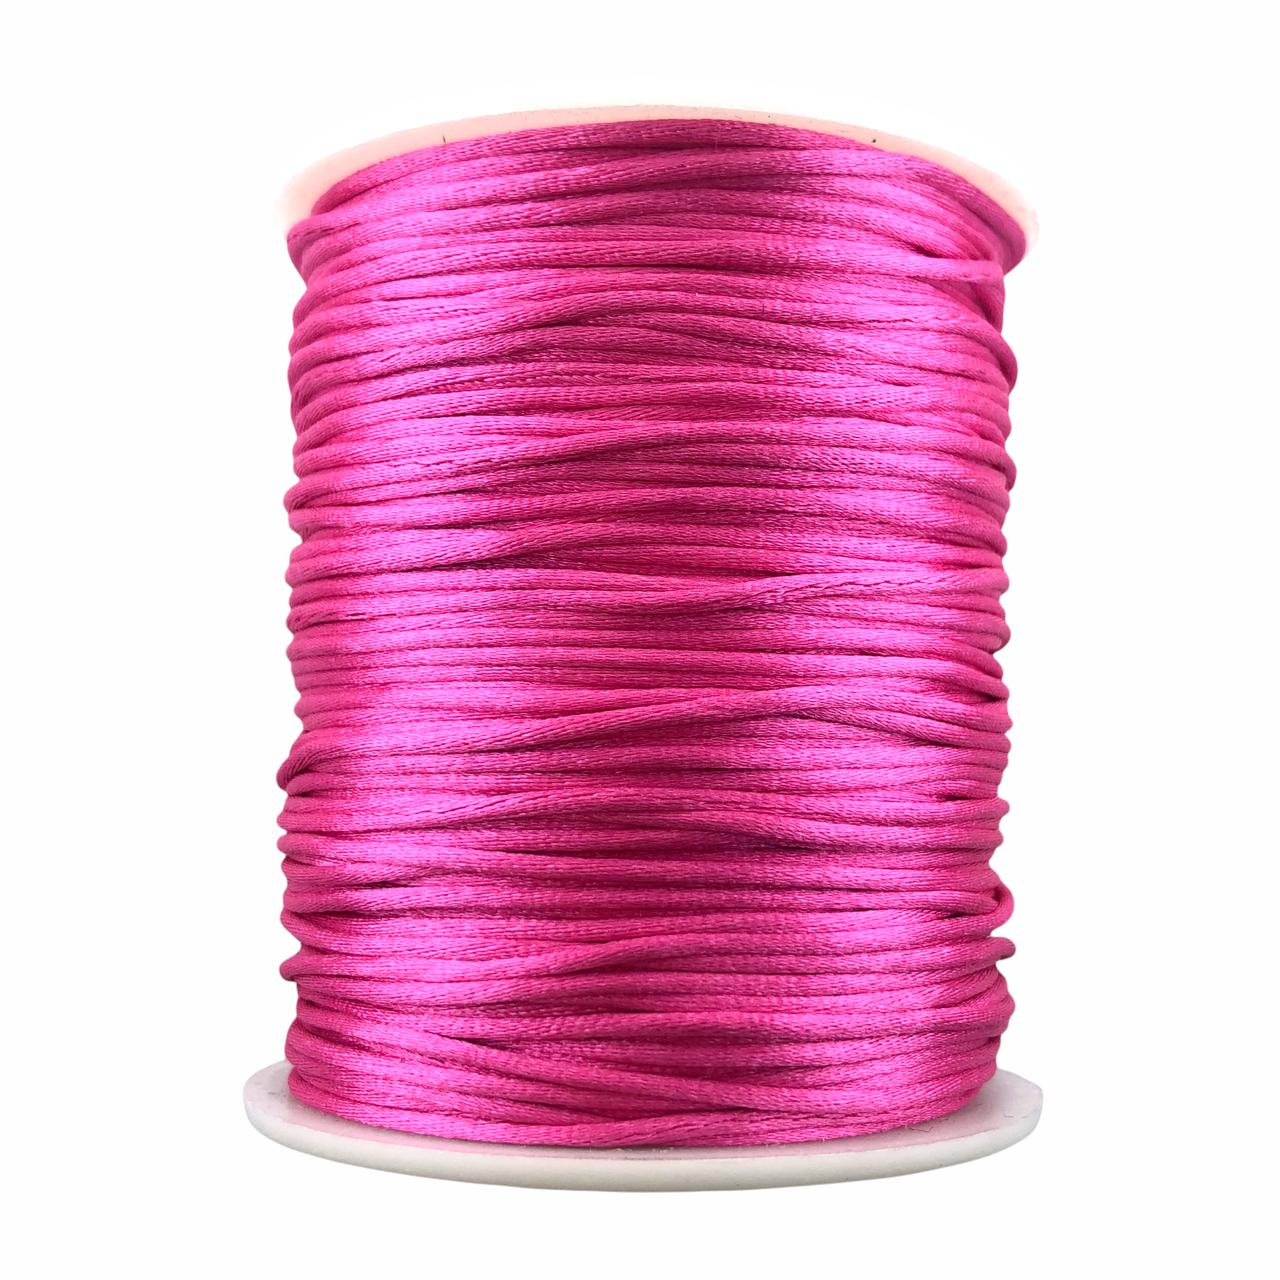 FS05 - Fio de Seda 1mm Pink Claro - 5metros